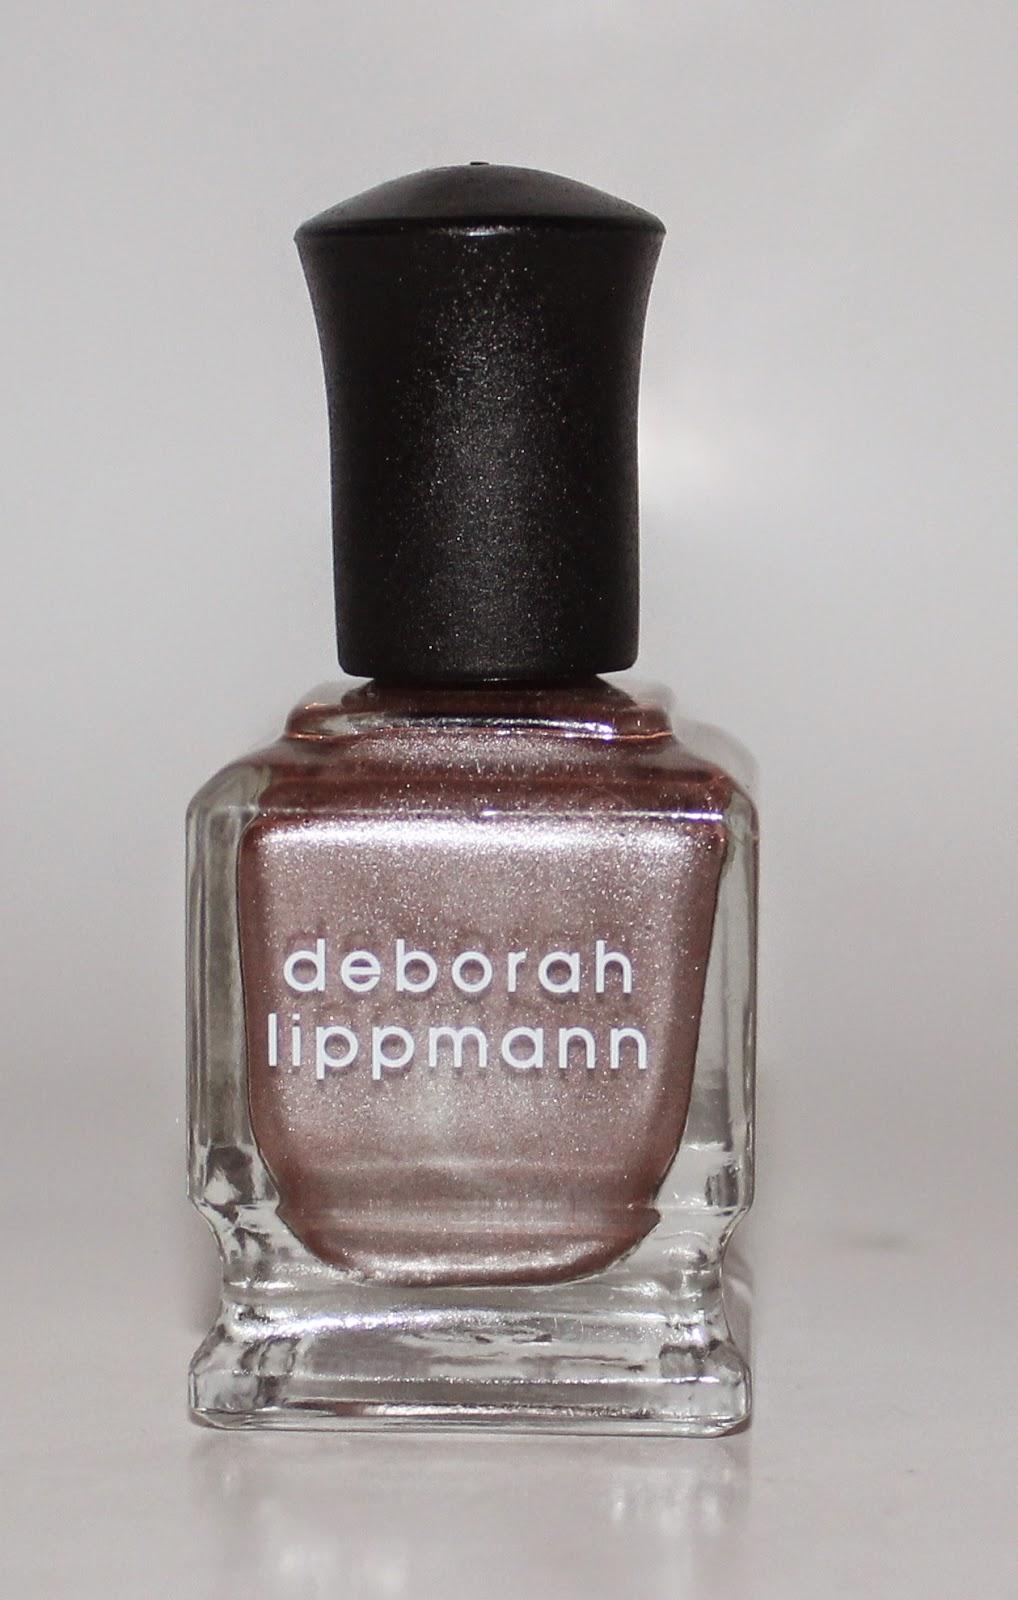 Deborah Lippmann Lullaby of Broadway